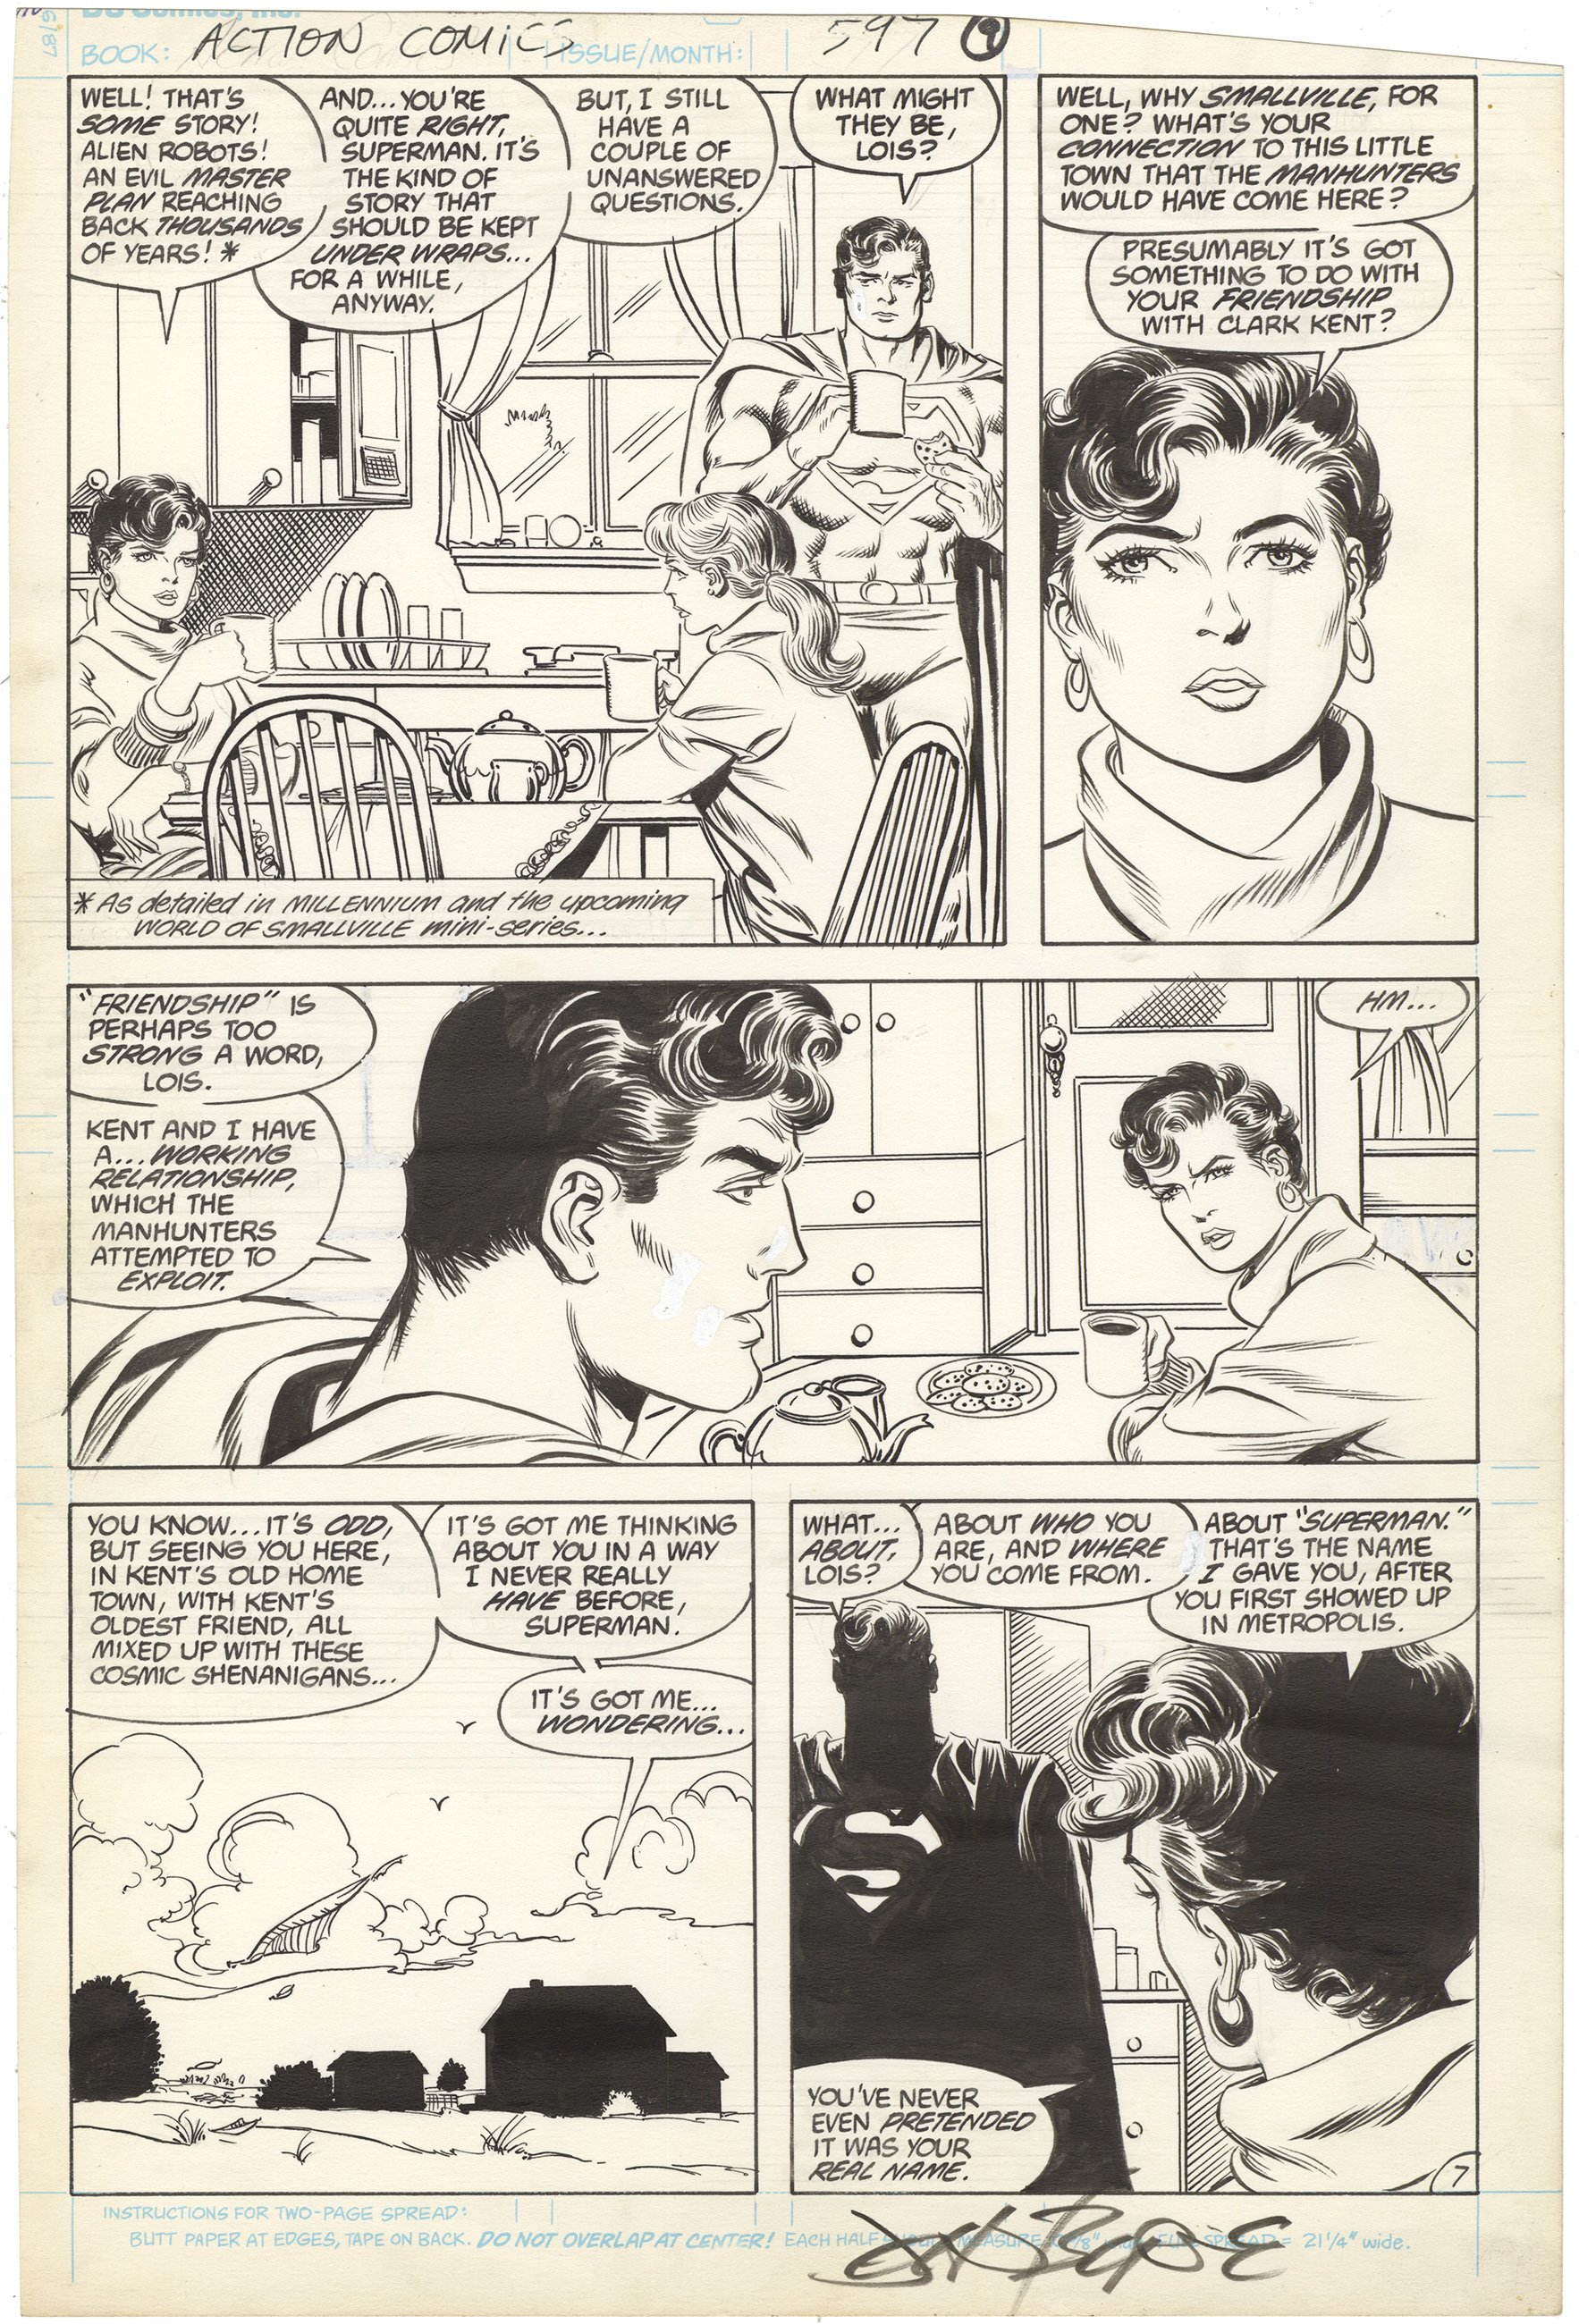 Action Comics #597 p7 (Signed)